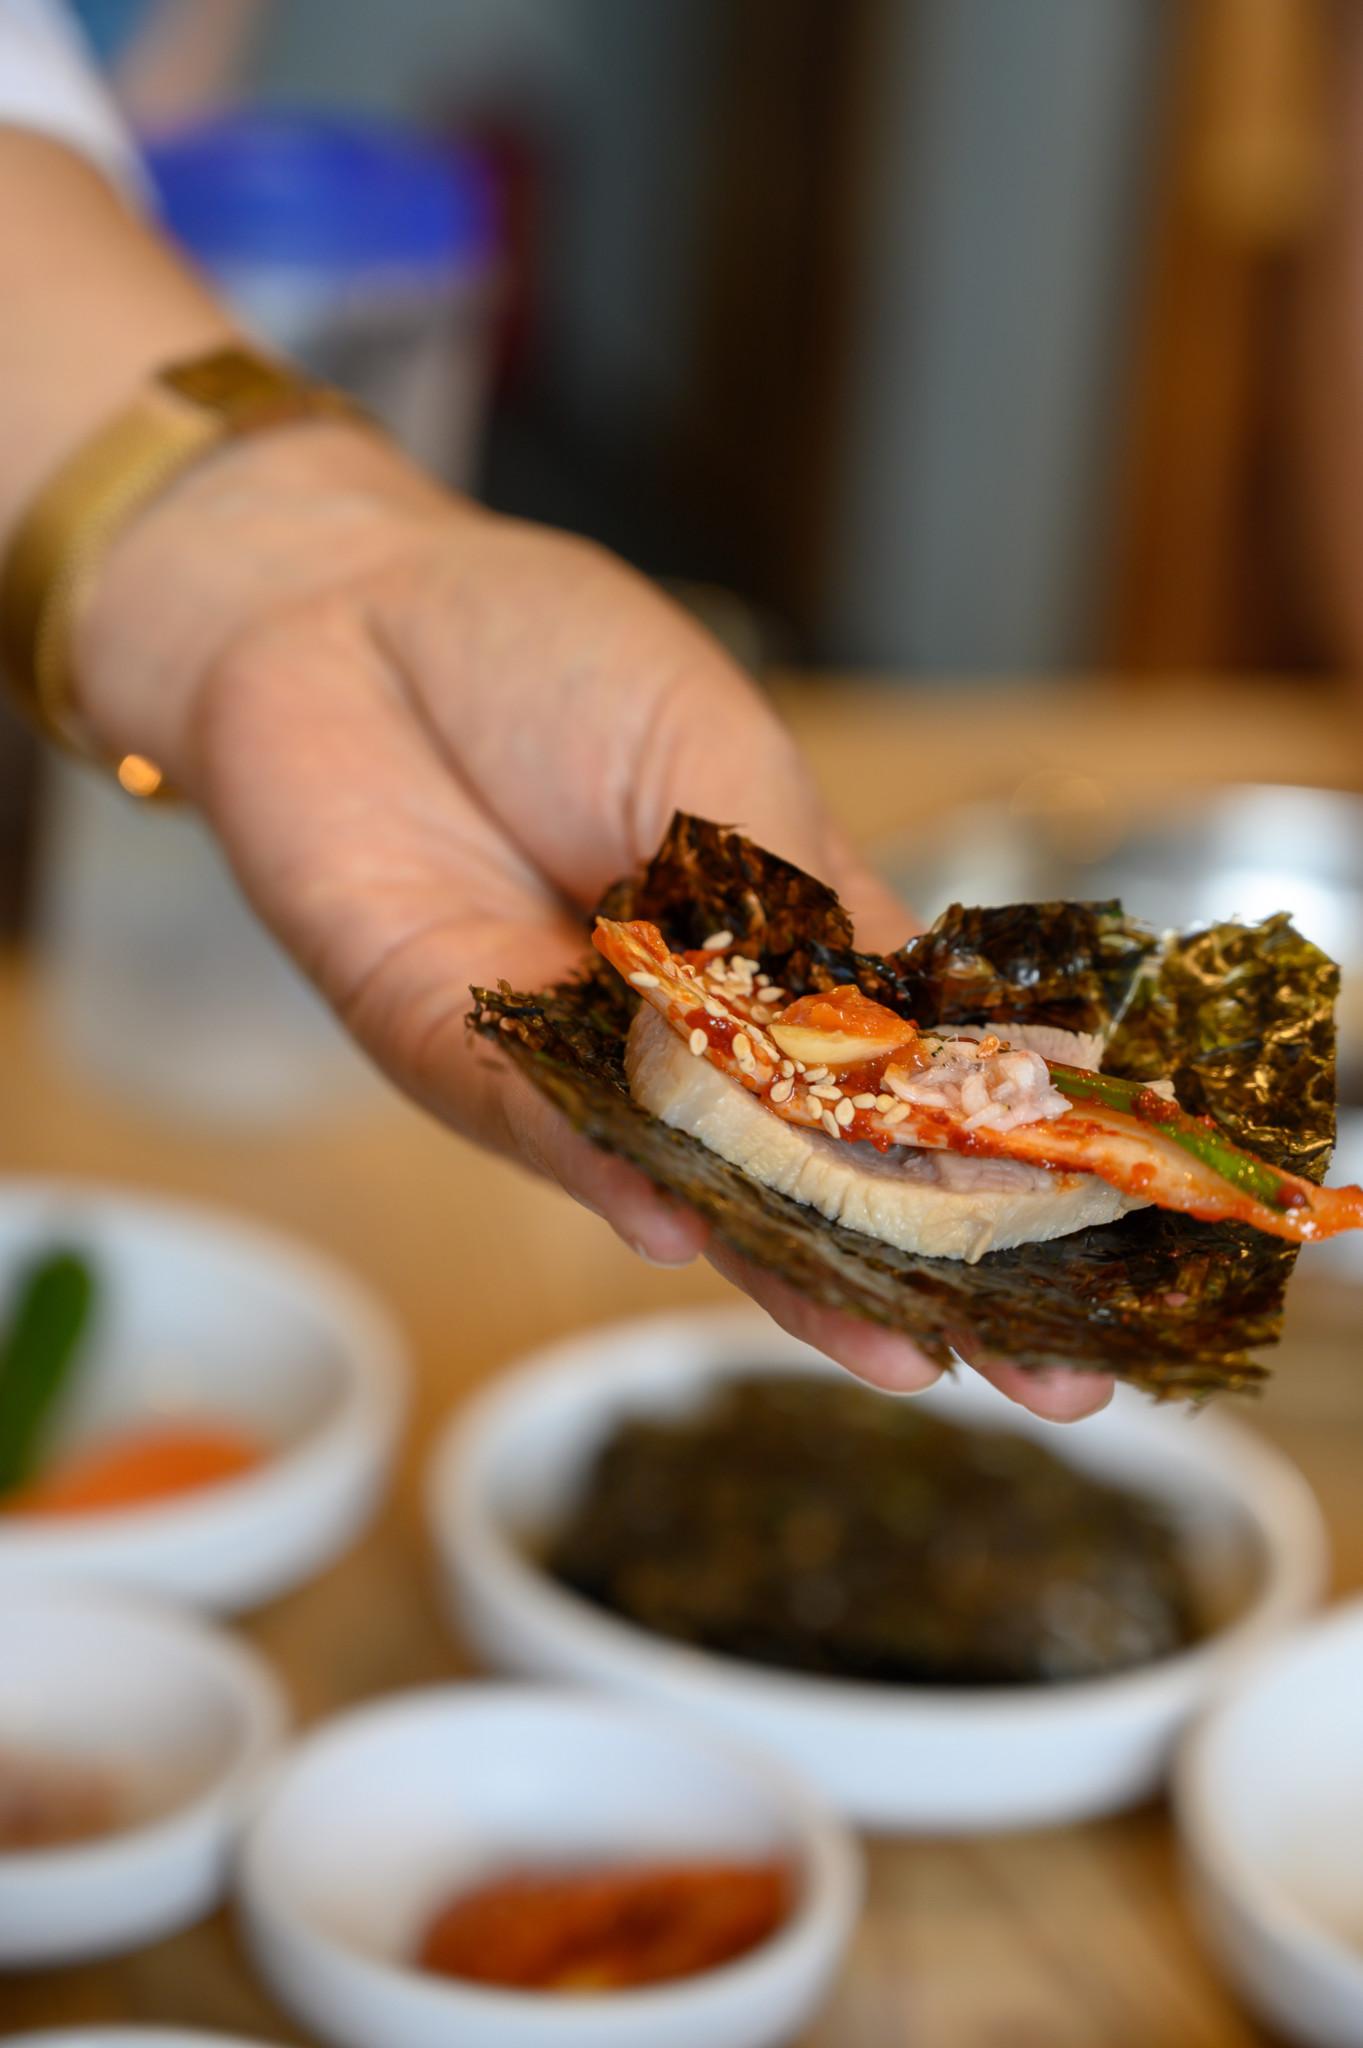 Koreanische Speisen in Korea